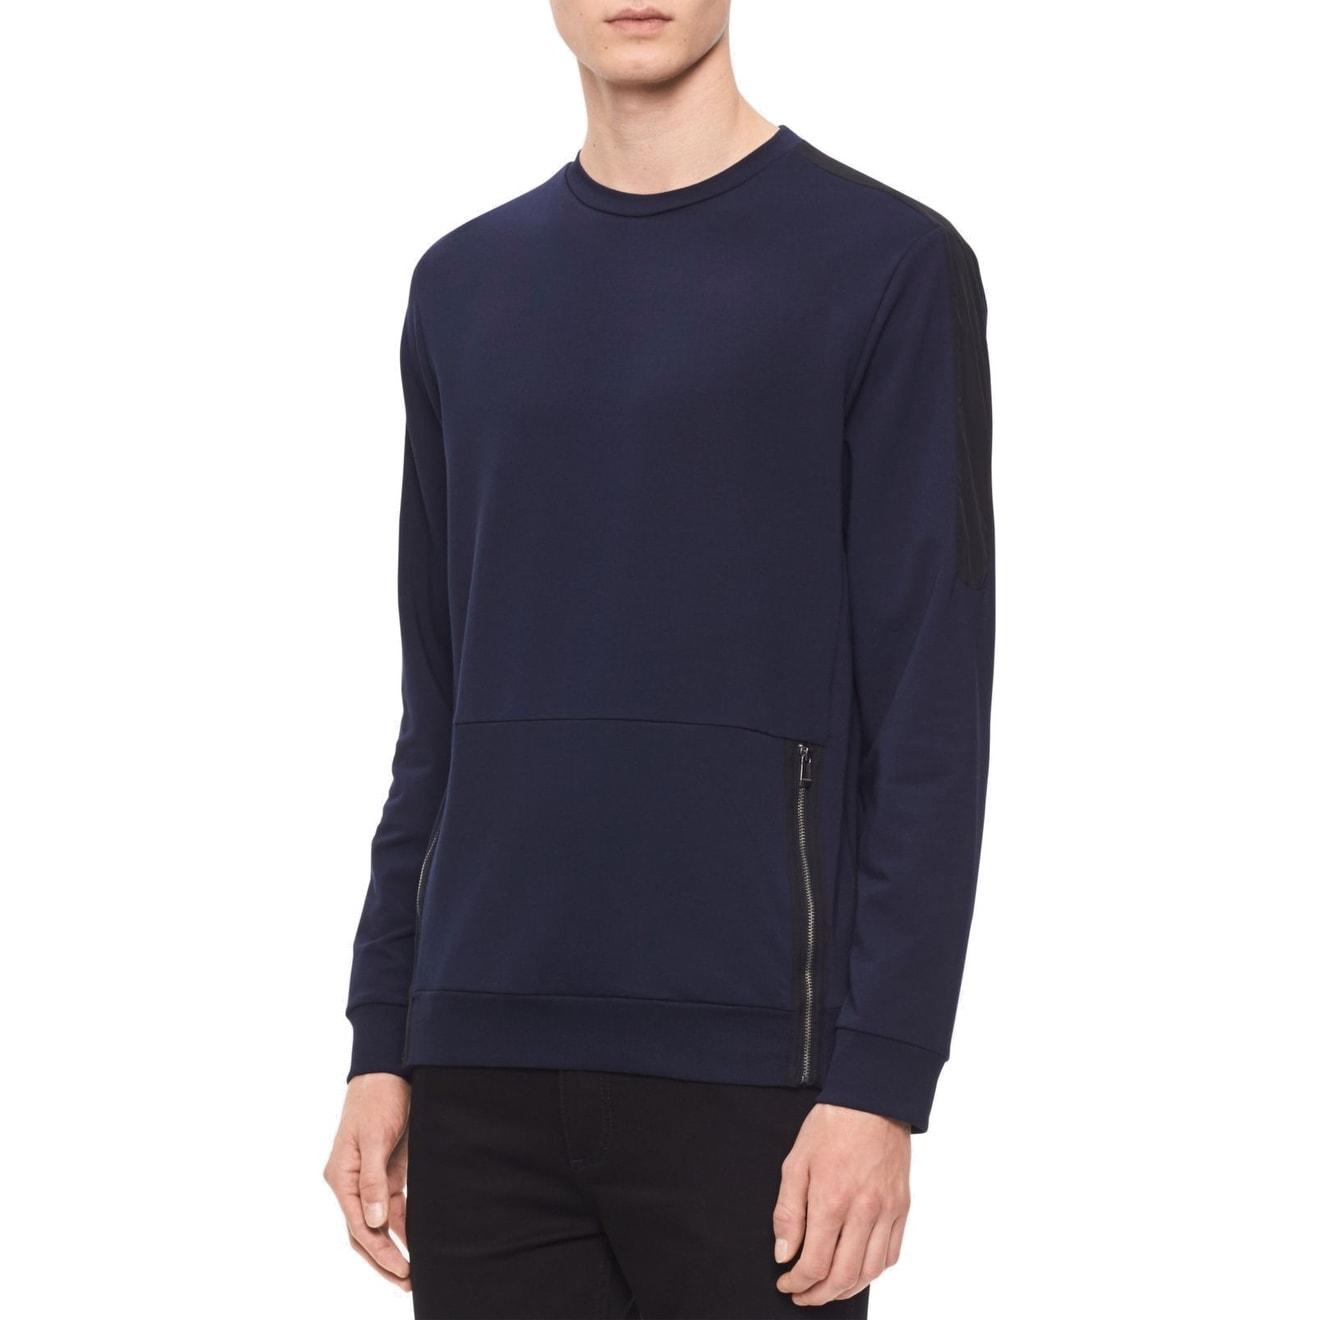 d1a6125fd34 Men's Calvin Klein Sweaters | Find Great Men's Clothing Deals ...